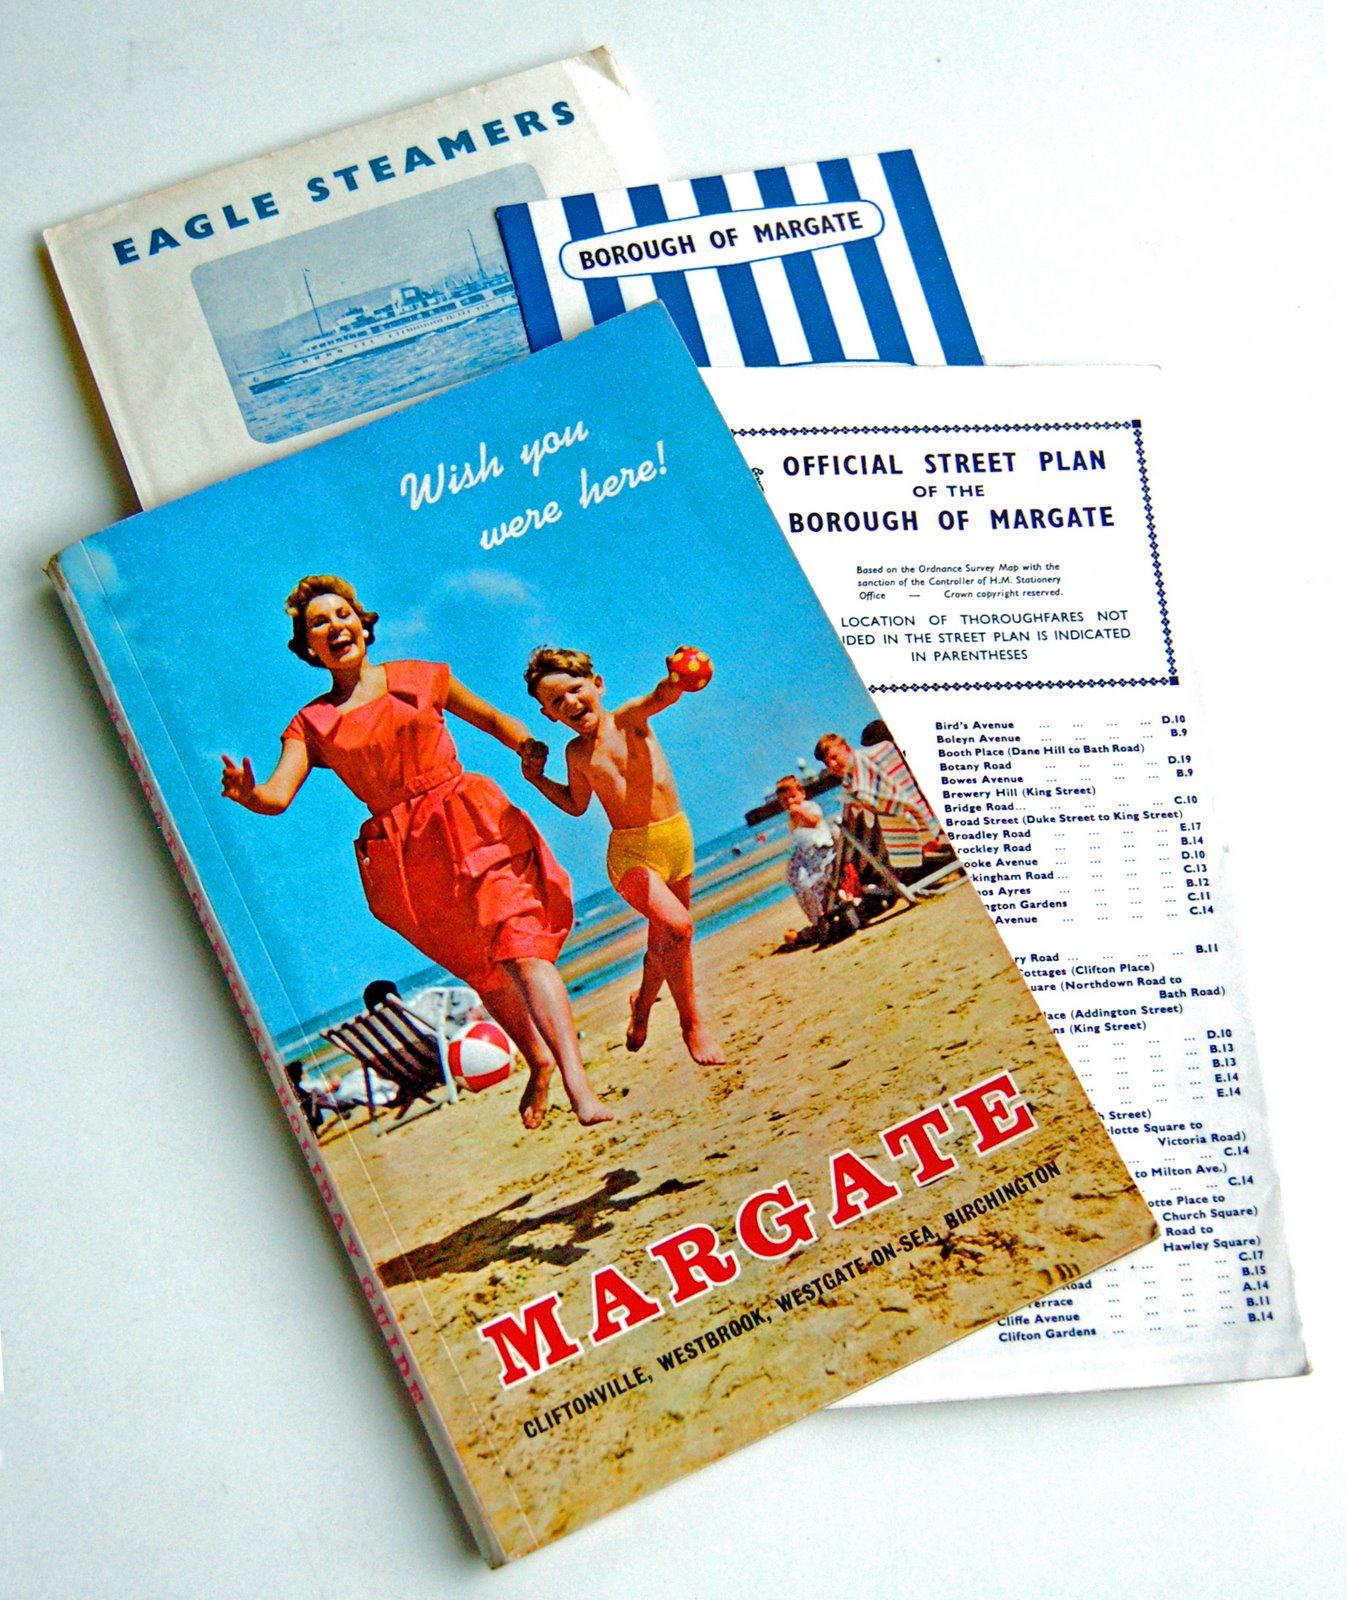 [Margate+guide+1]